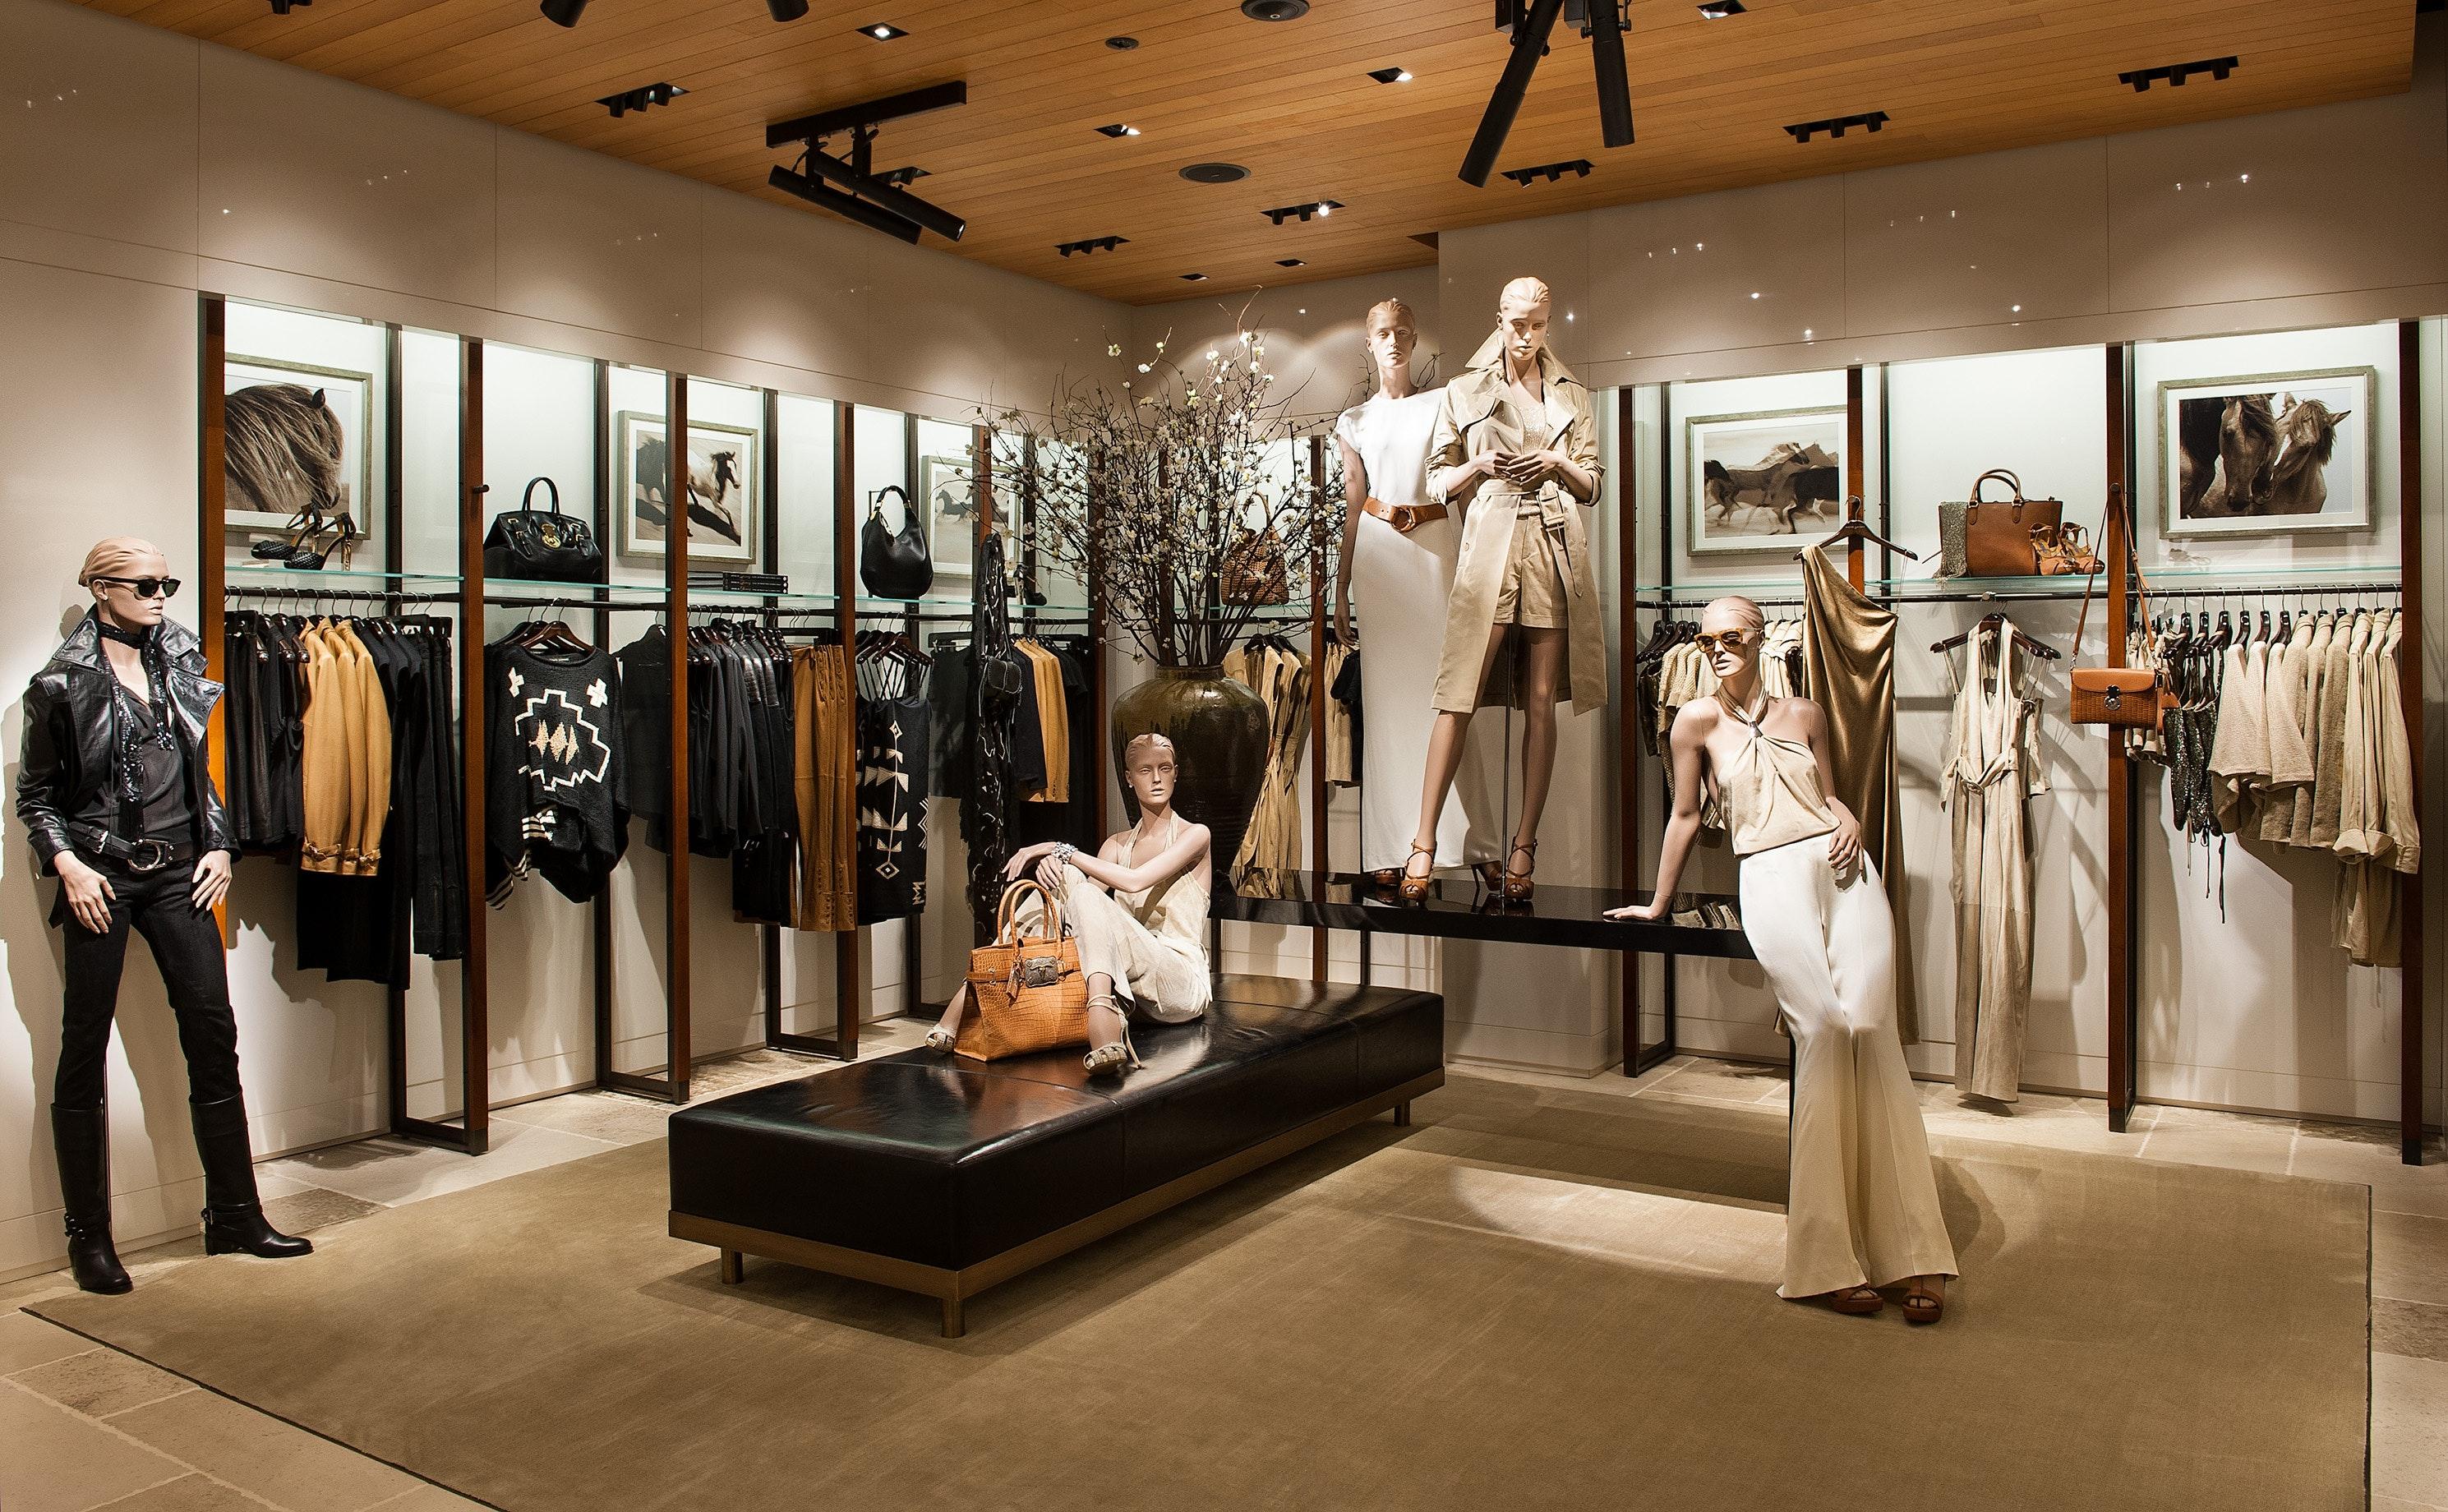 Models outfit falls off at lakme fashion week USS Monitor - Wikipedia